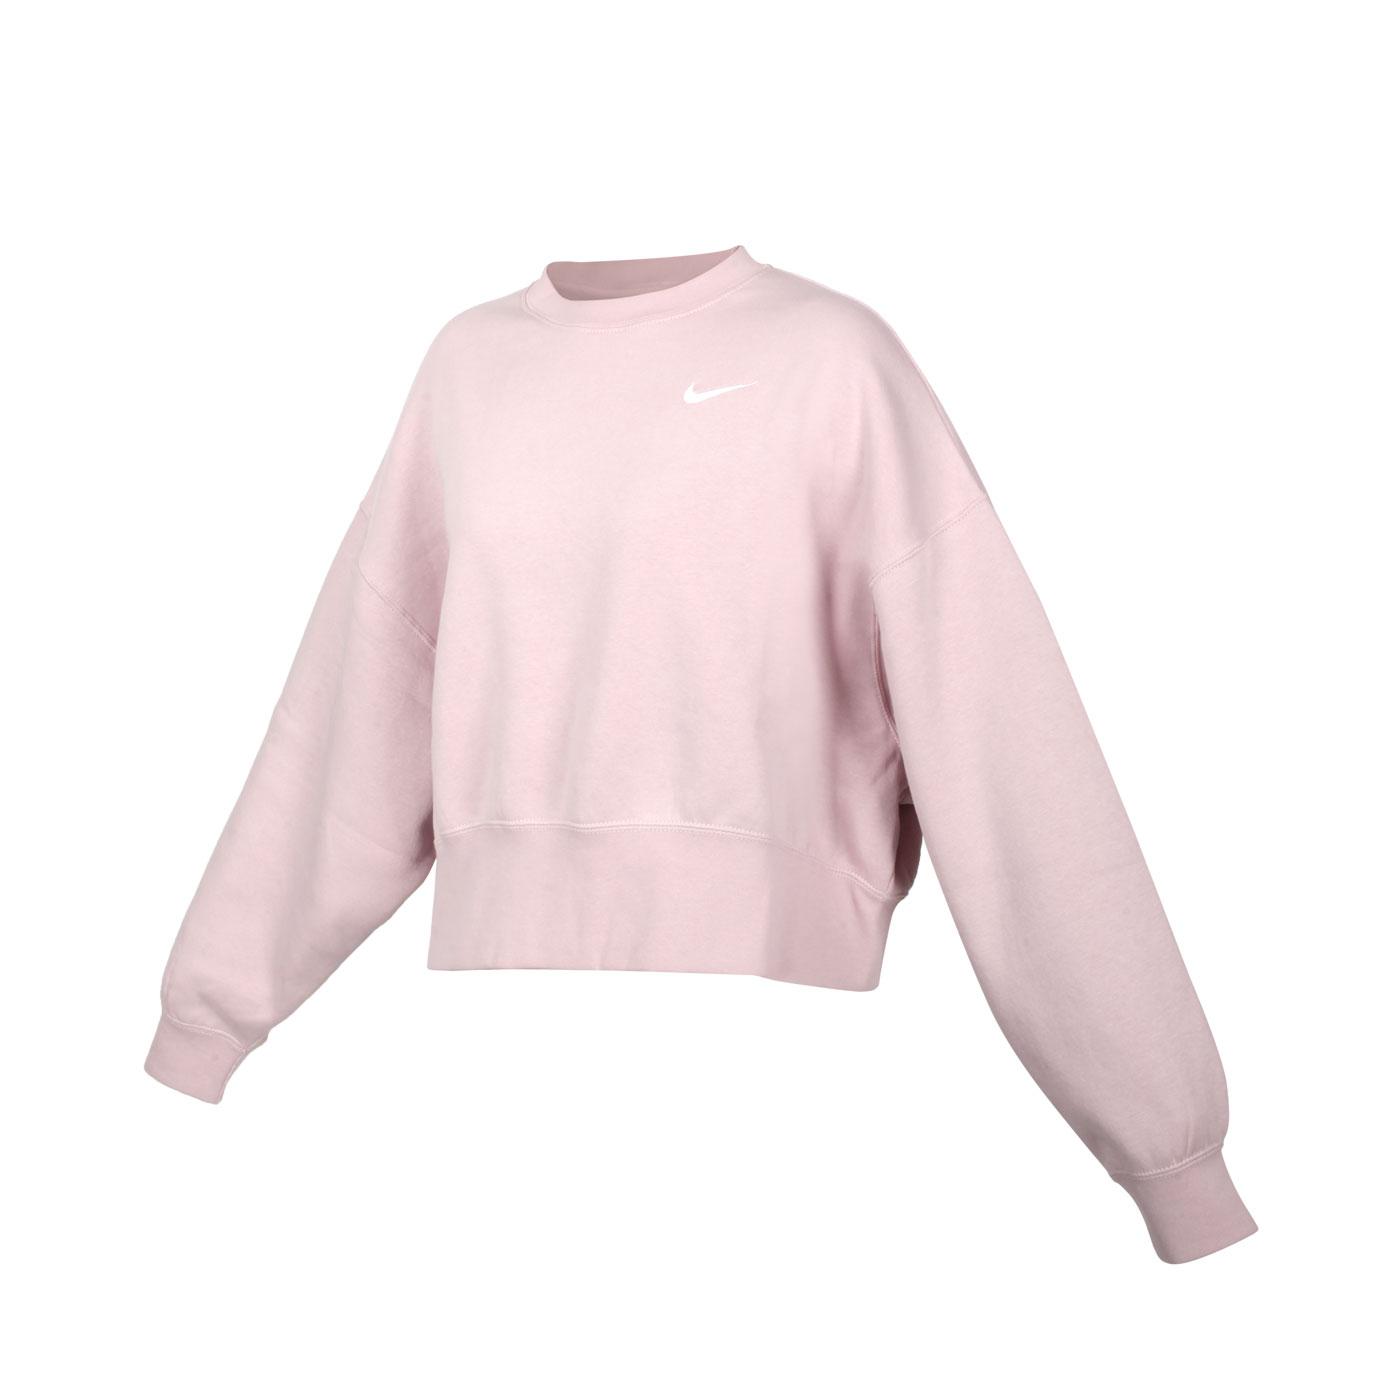 NIKE 女款長袖T恤 CK0169-645